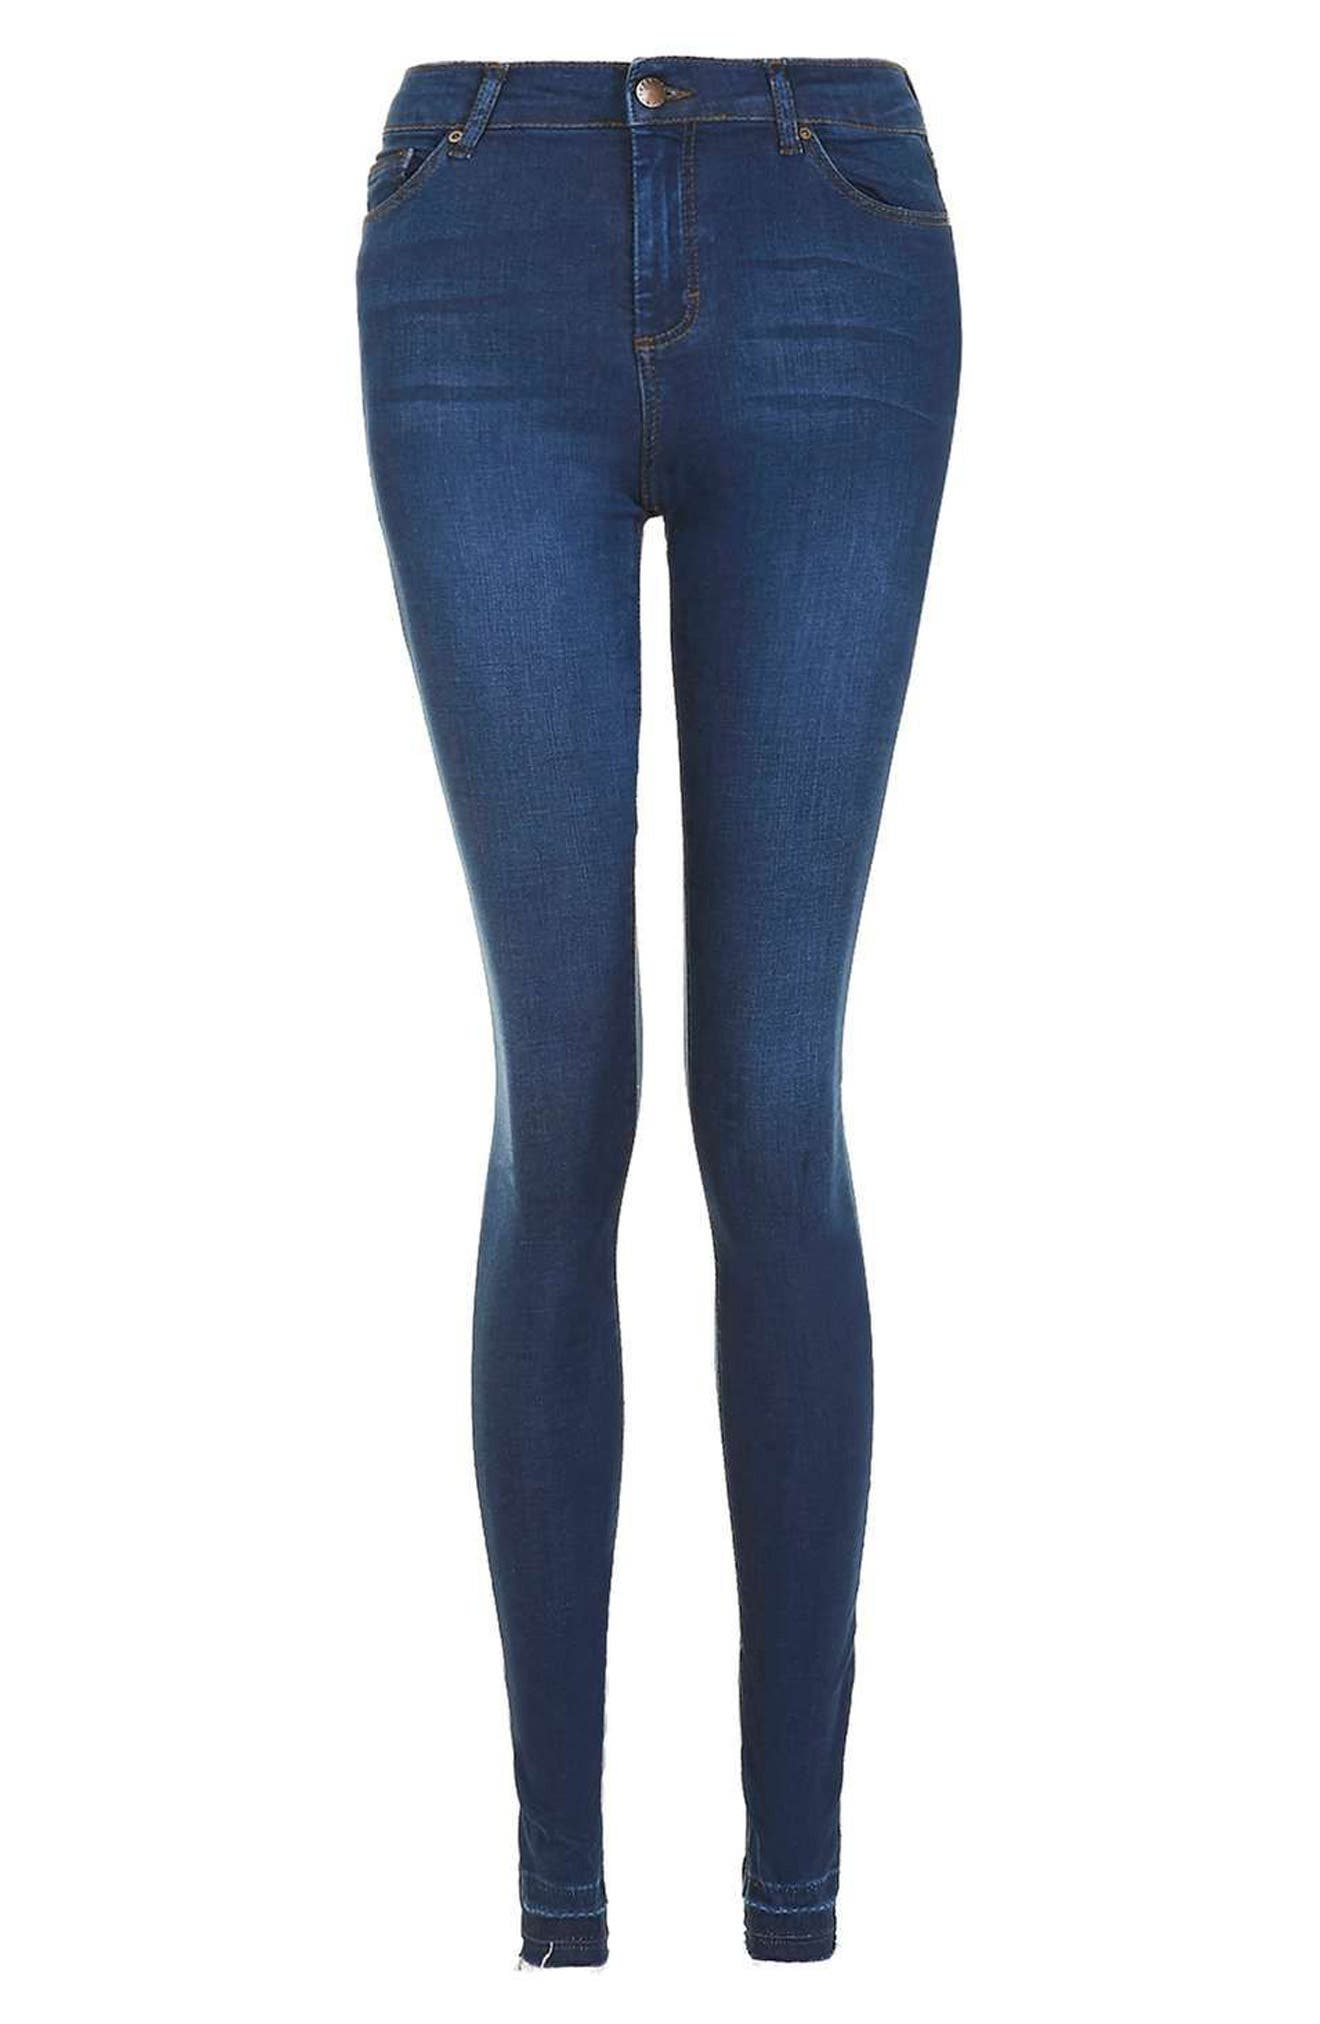 Leigh Release Hem Skinny Jeans,                             Alternate thumbnail 4, color,                             401